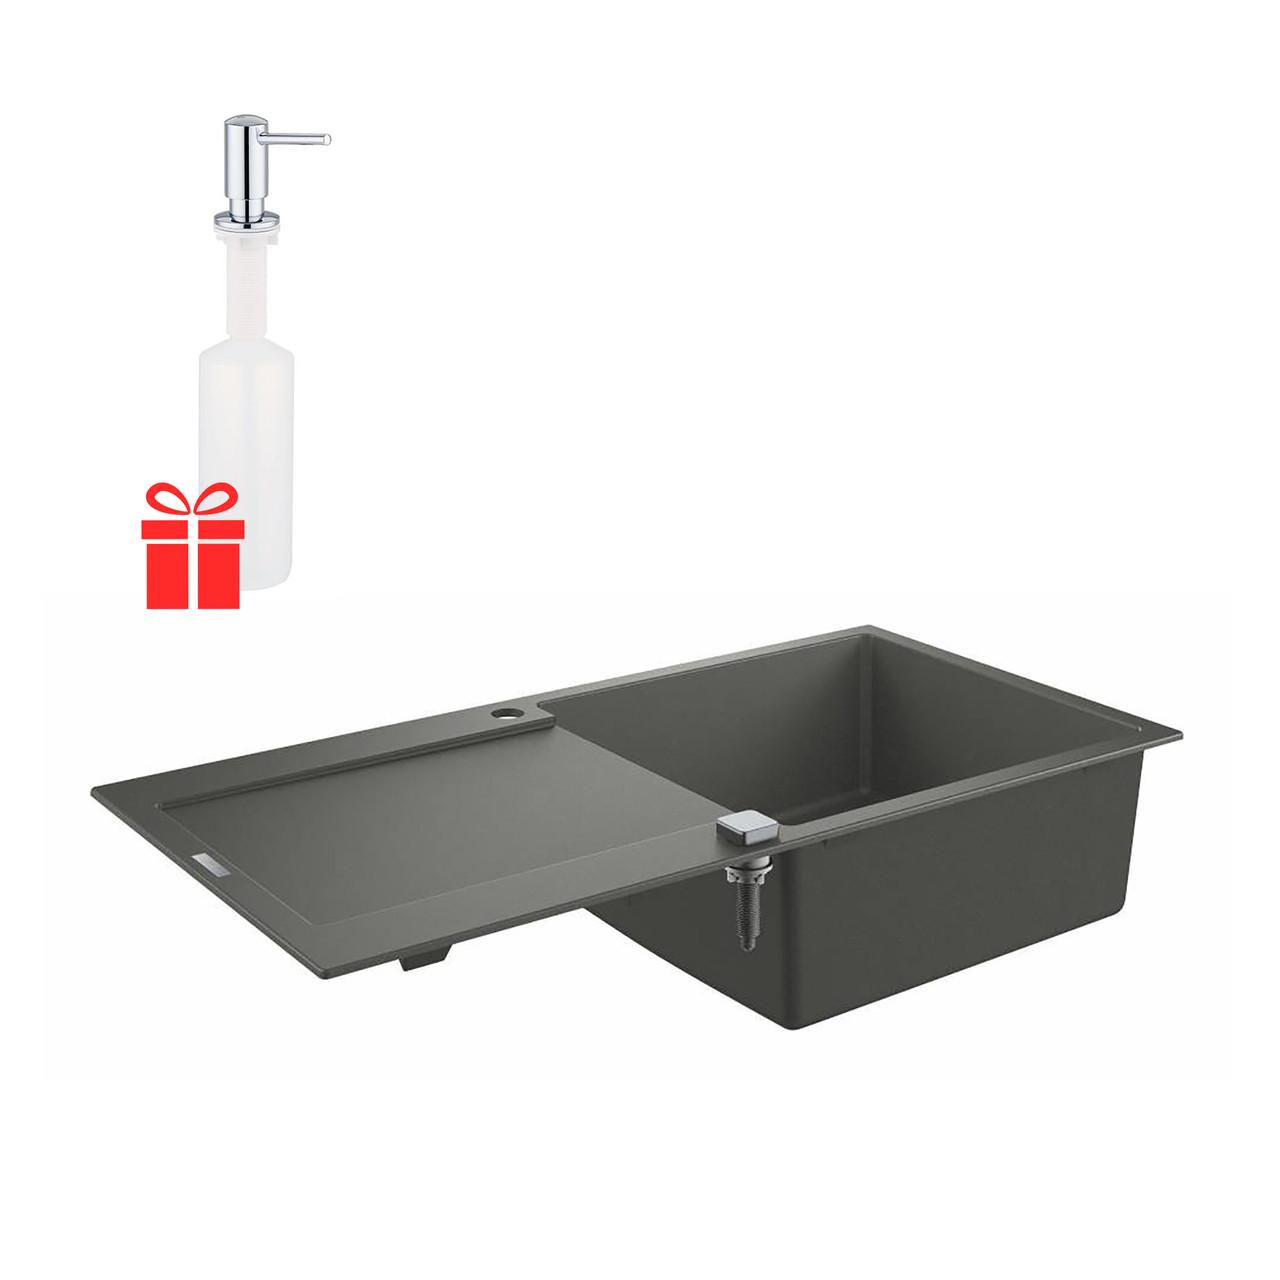 Набір Grohe мийка кухонна K500 31645AT0 + дозатор для миючого засобу Contemporary 40536000